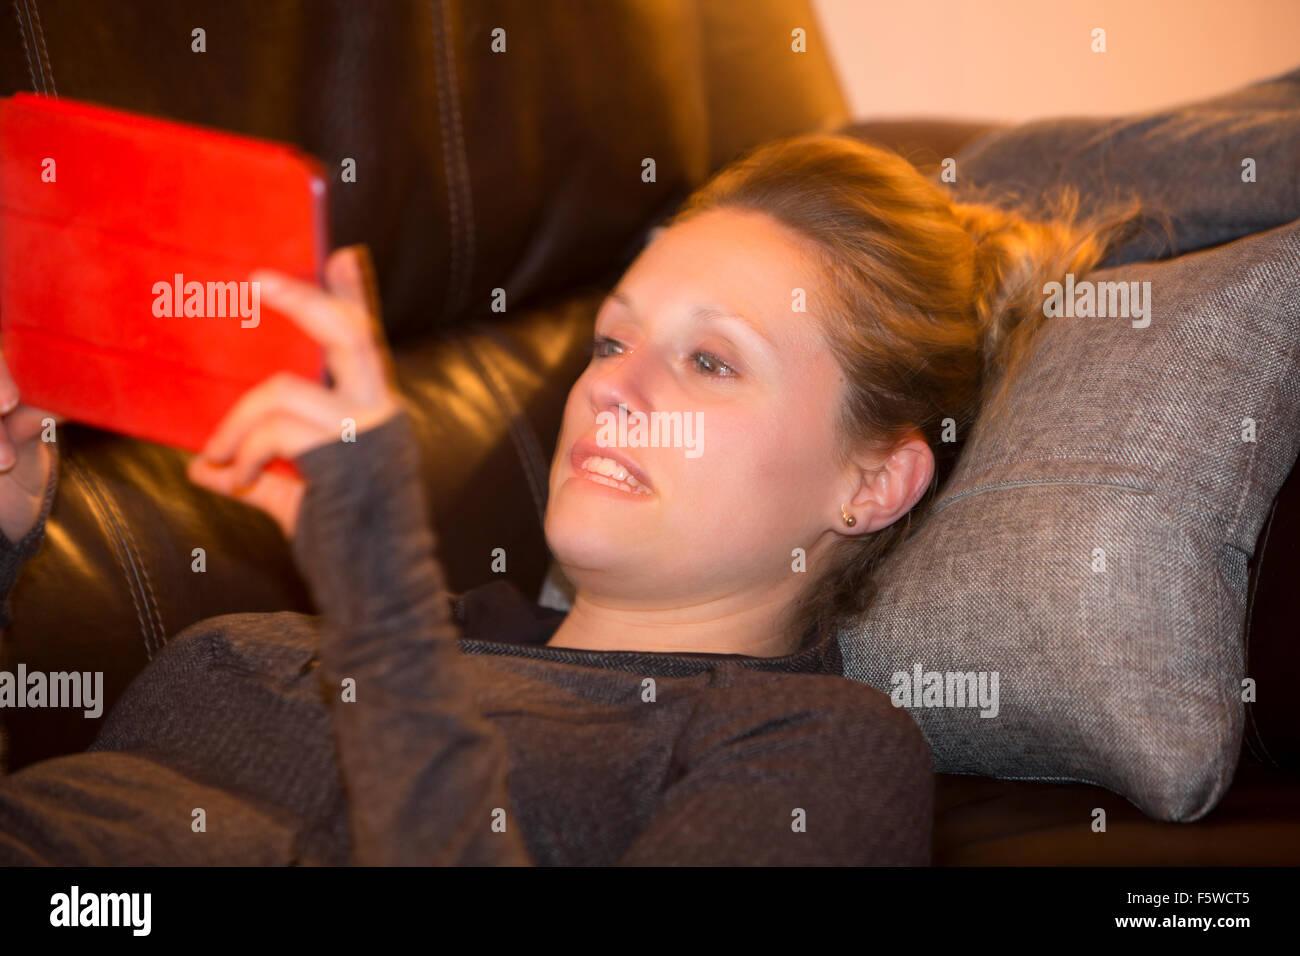 woman using digital tablet computer - Stock Image